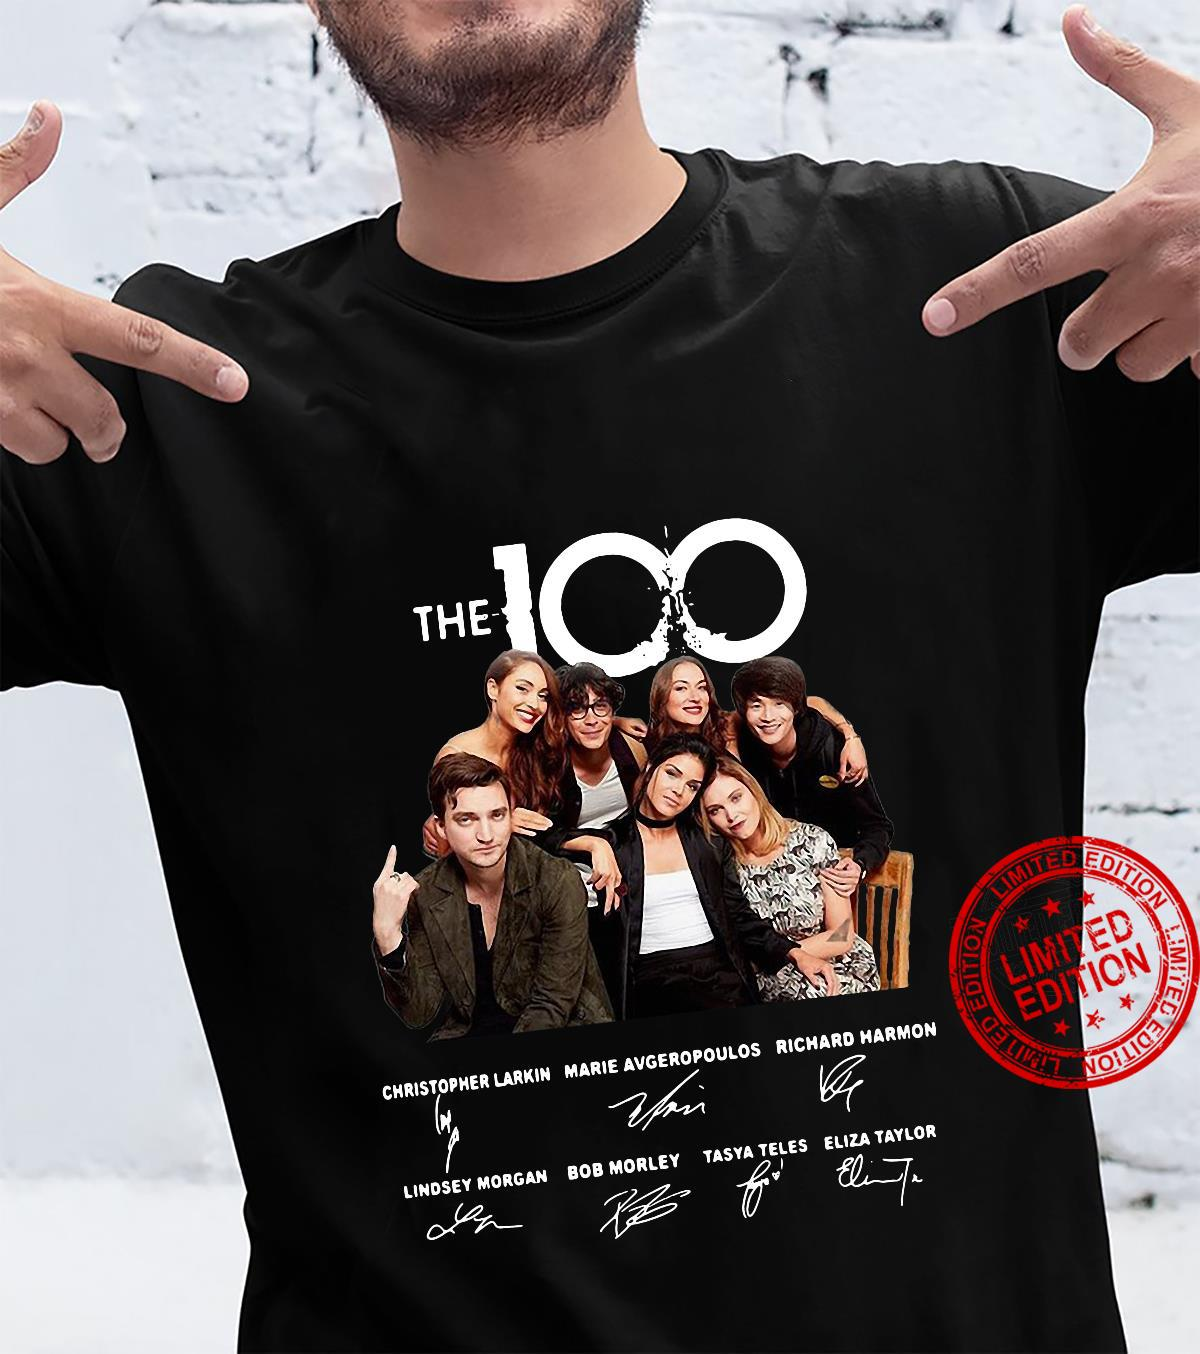 The 100 Casts Signature Shirt